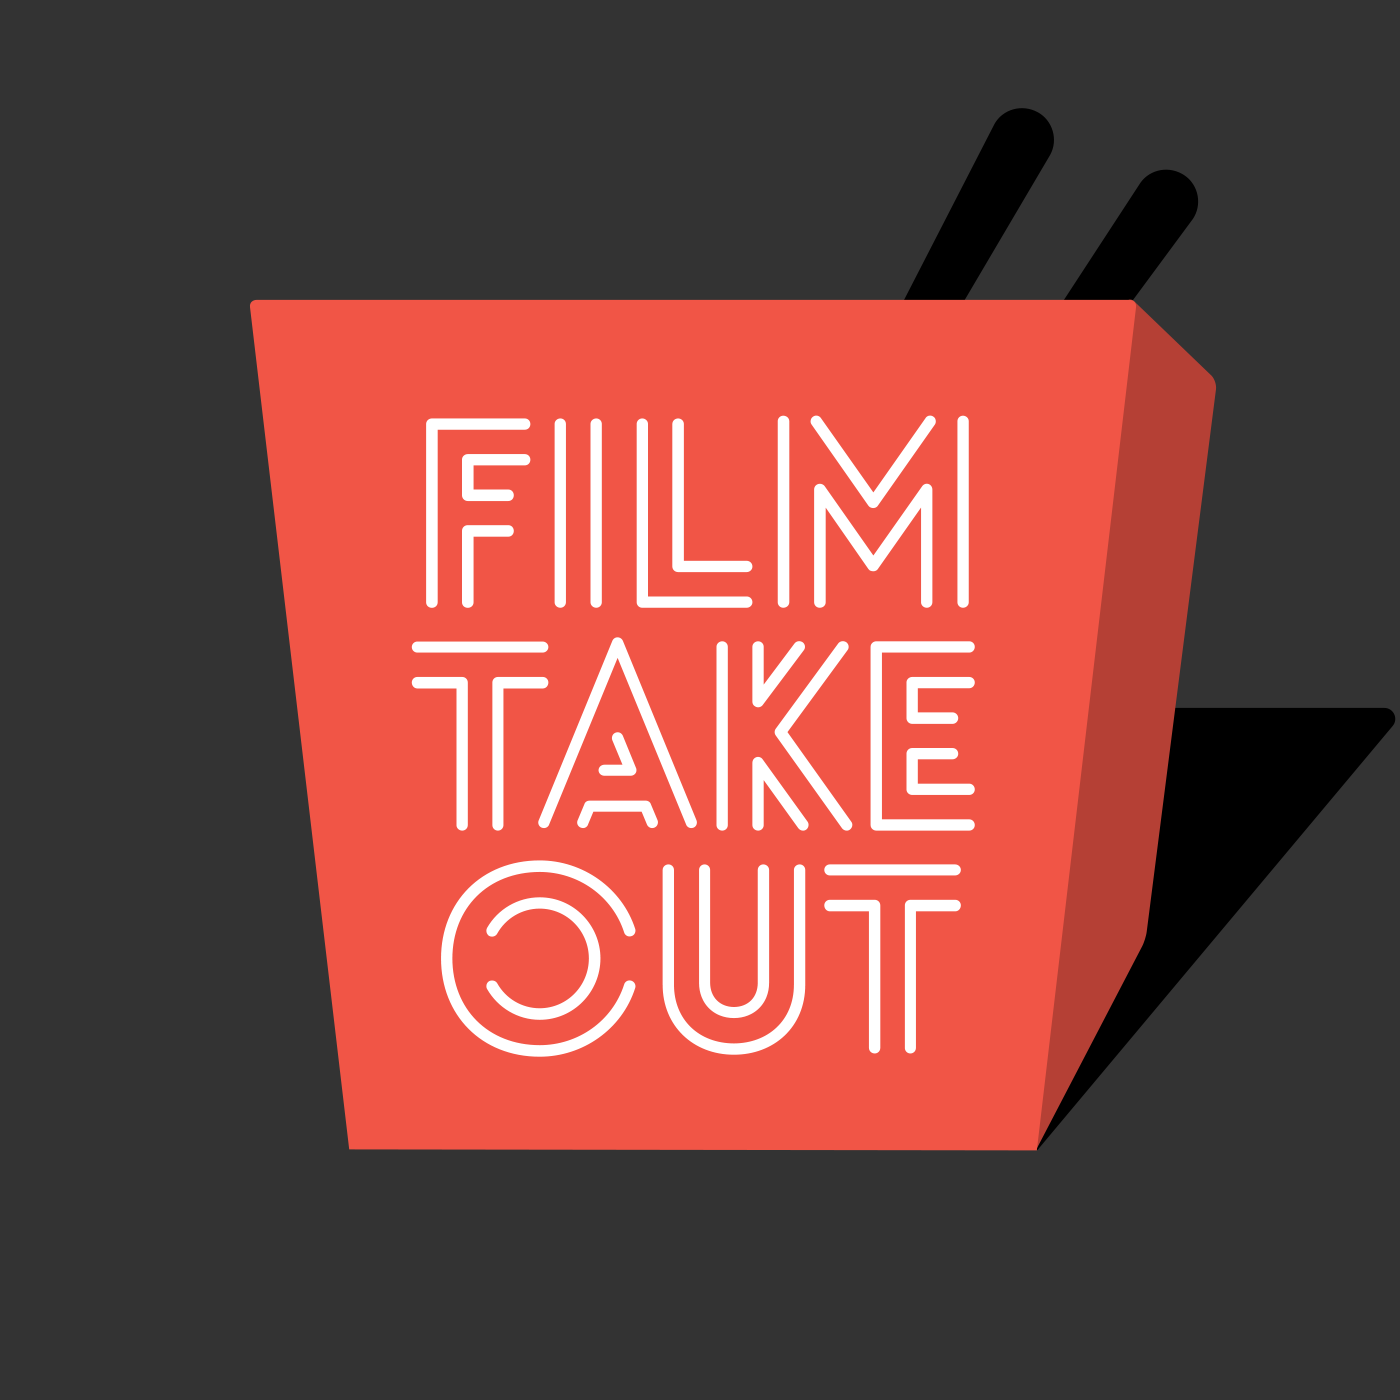 Film Takeout